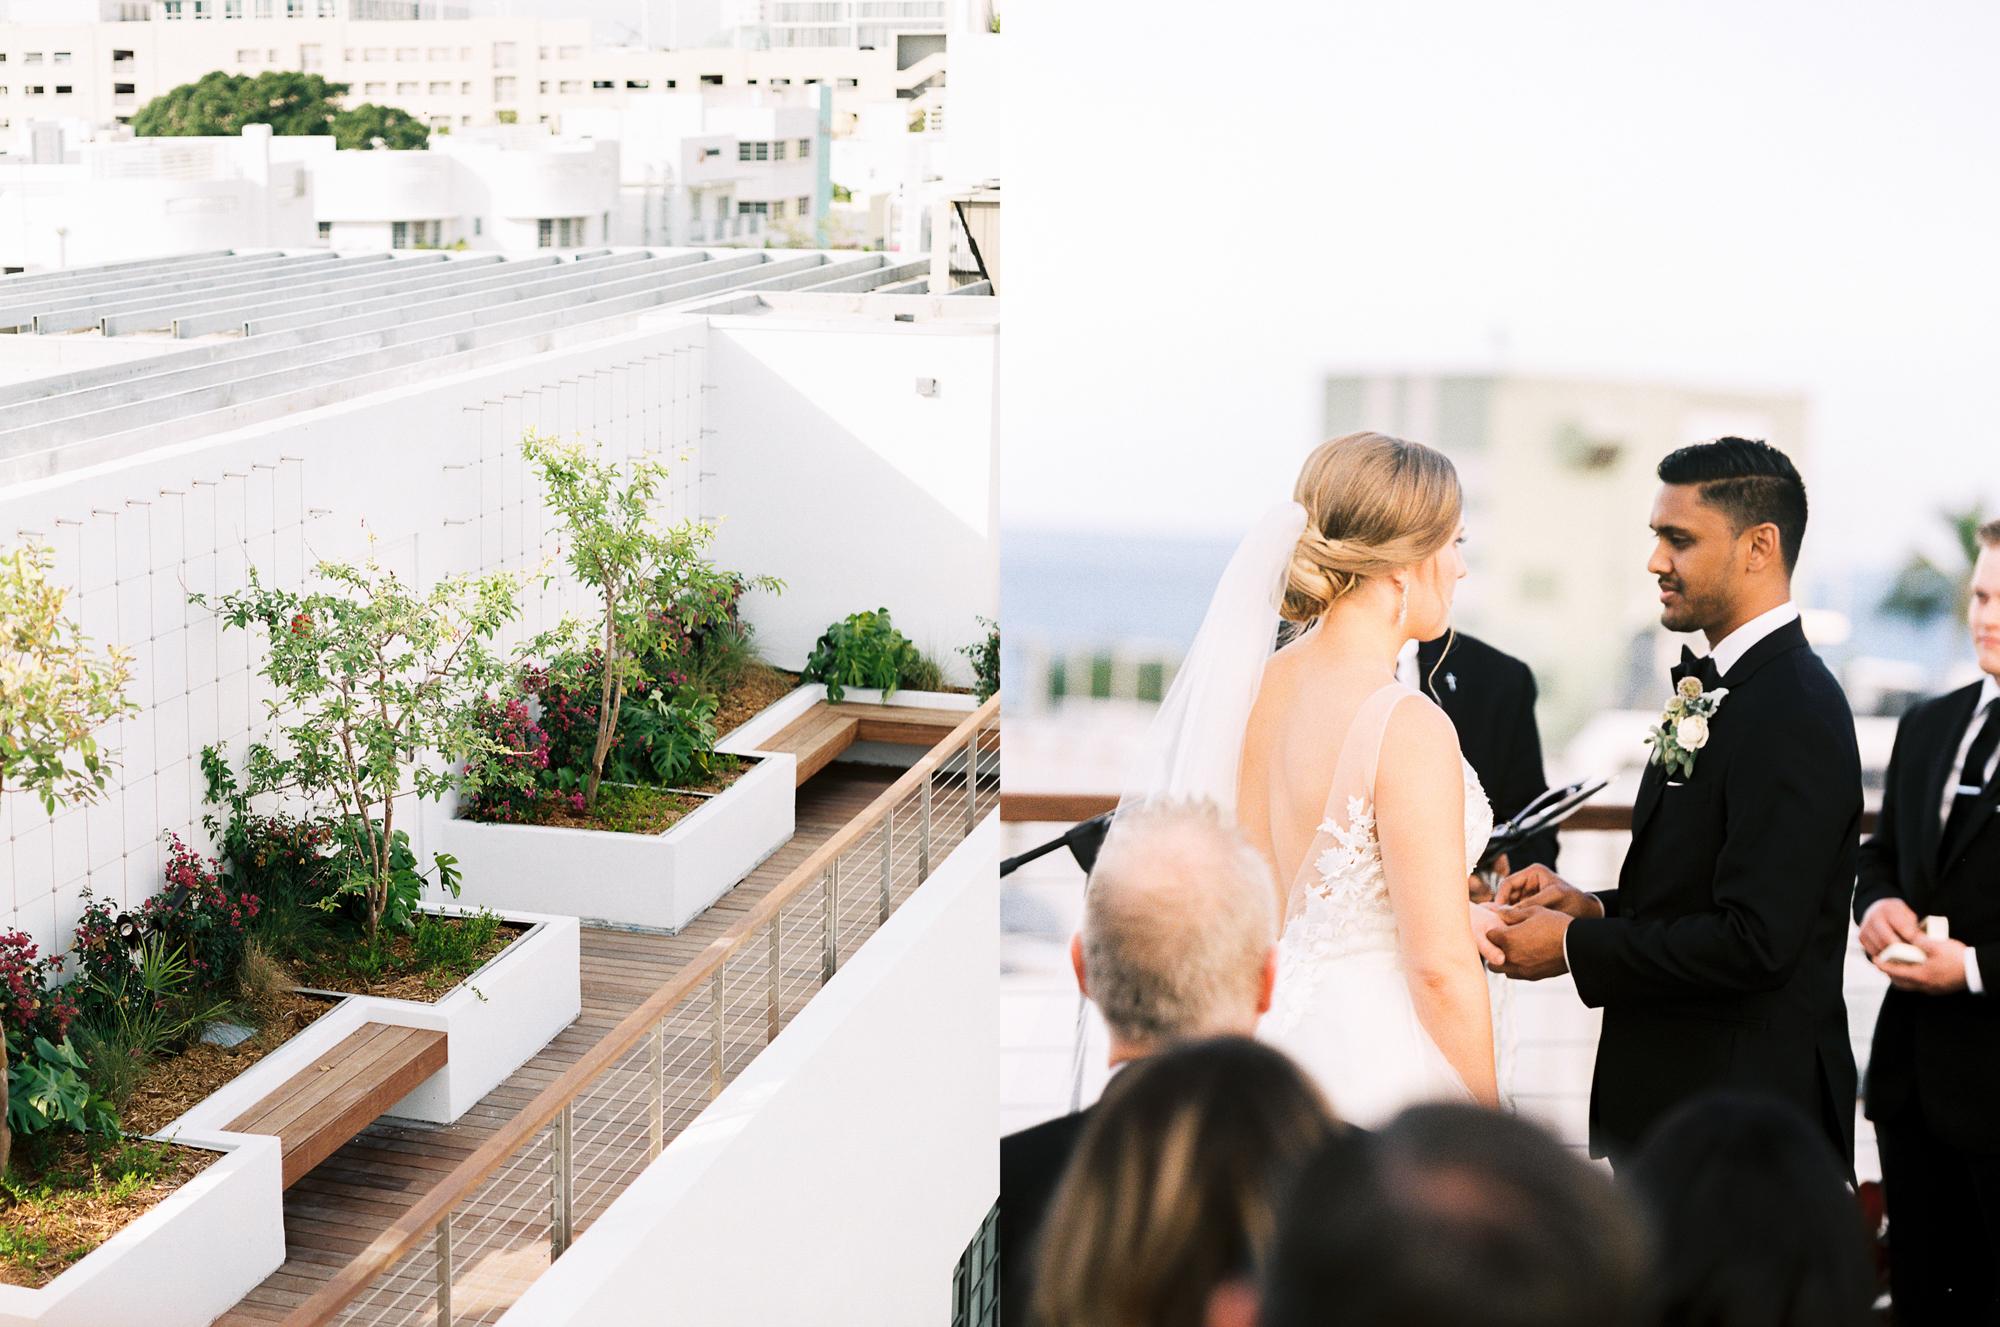 betsy-hotel-wedding-south-beach-miami-charleston-south-carolina-destination-wedding-photographer-21.jpg